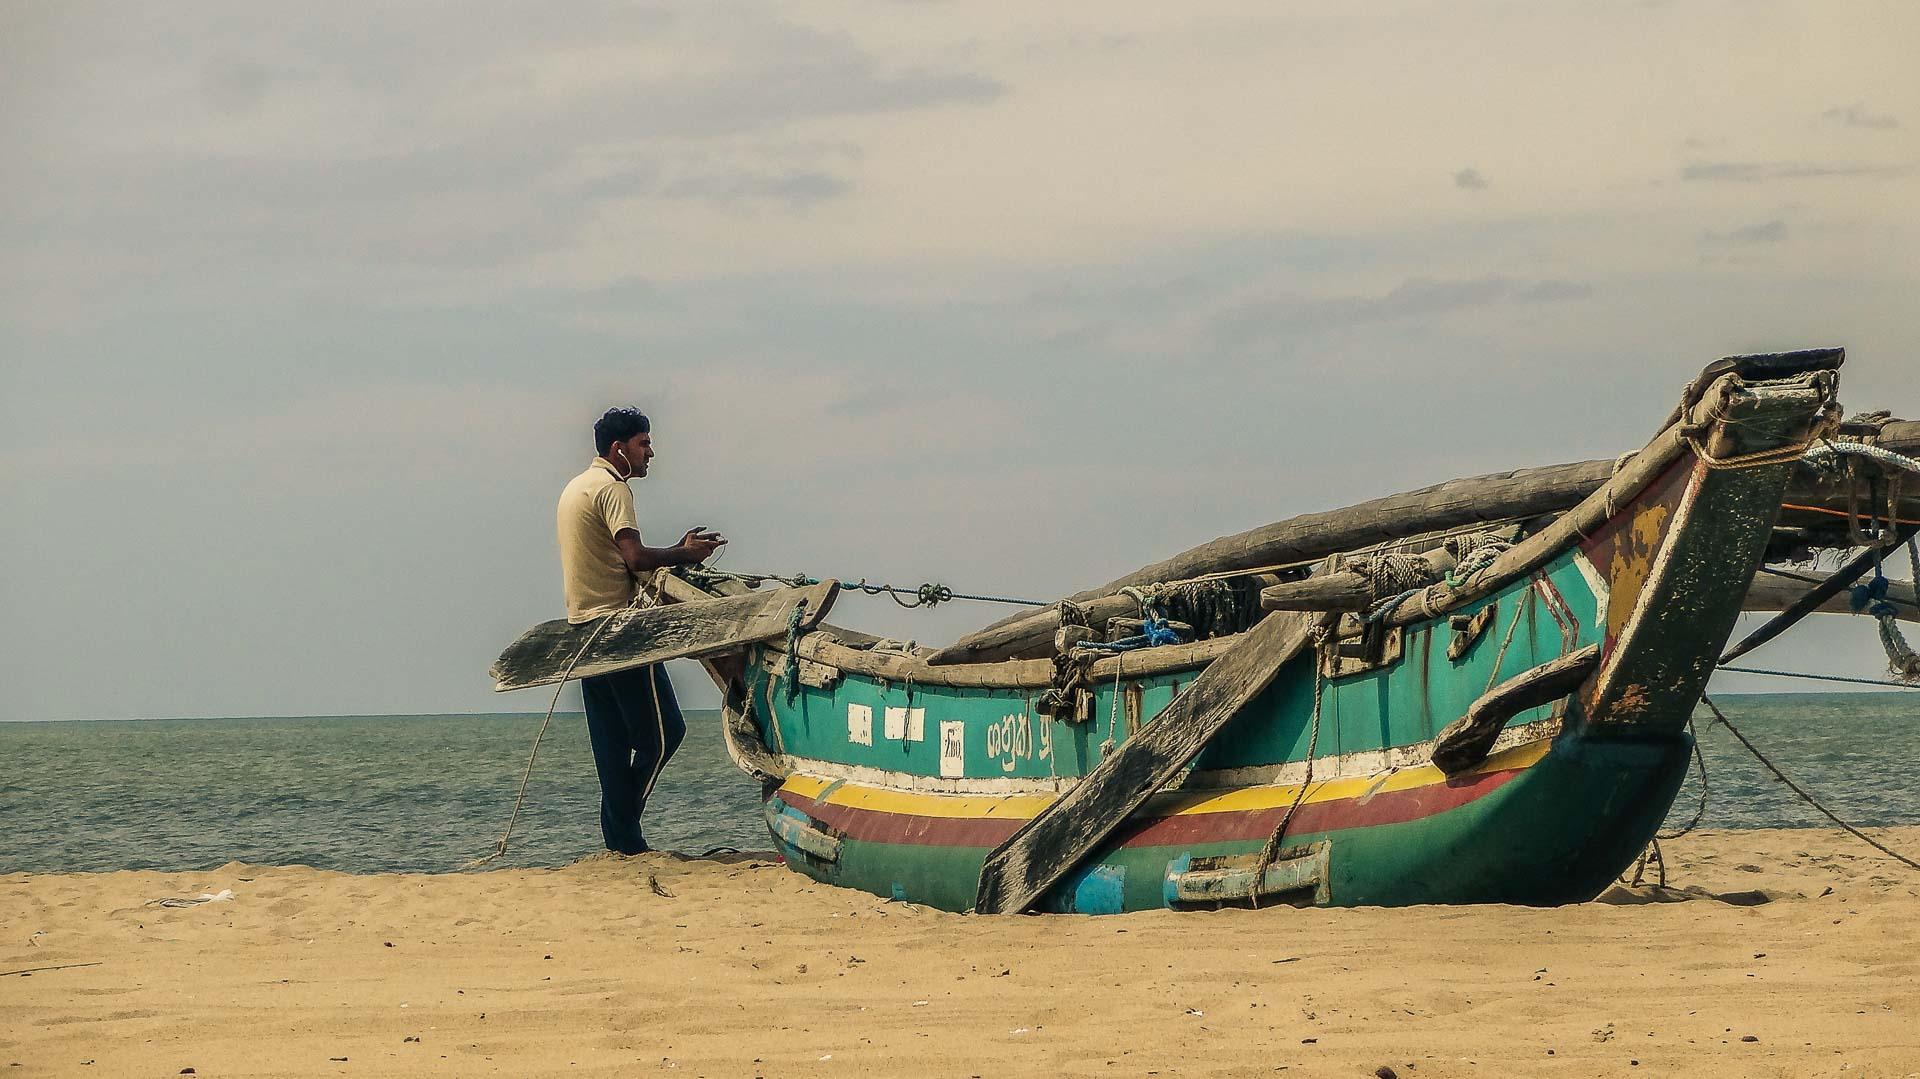 Dude listening to music on the beach in Negombo, Sri Lanka